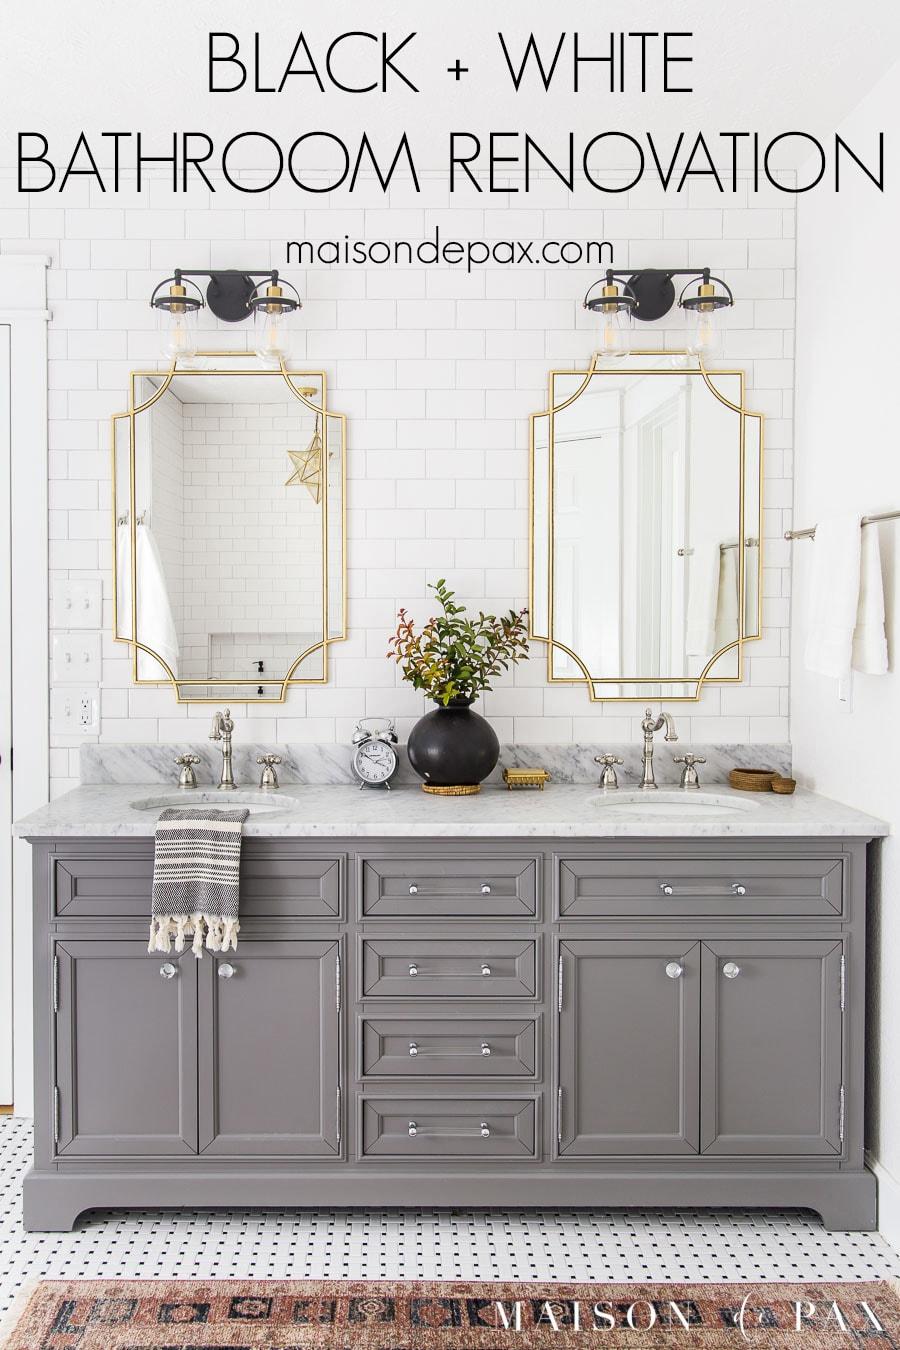 black and white bathroom renovation ideas